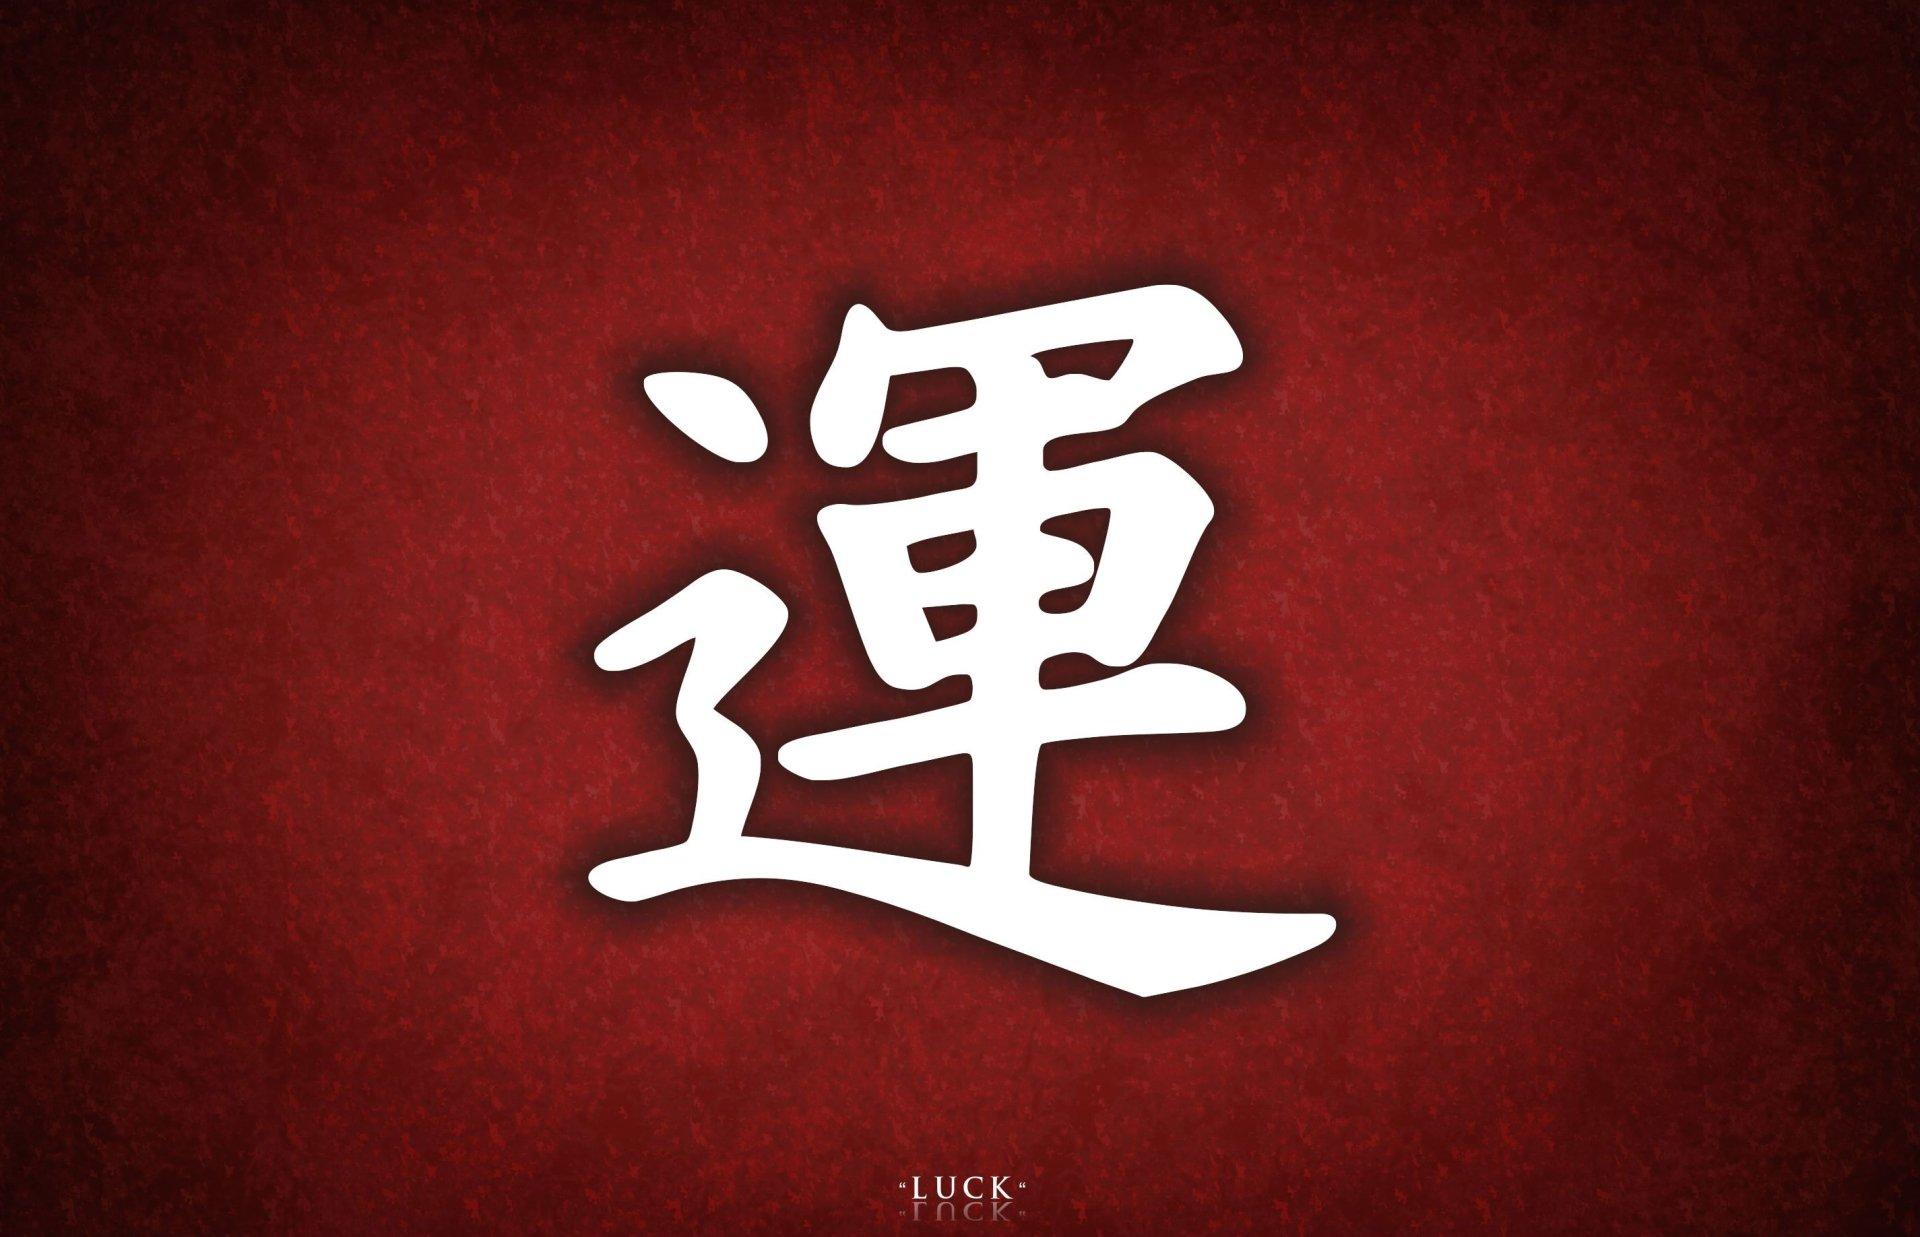 Kanji Symbol For Luck Full HD Wallpaper And Background